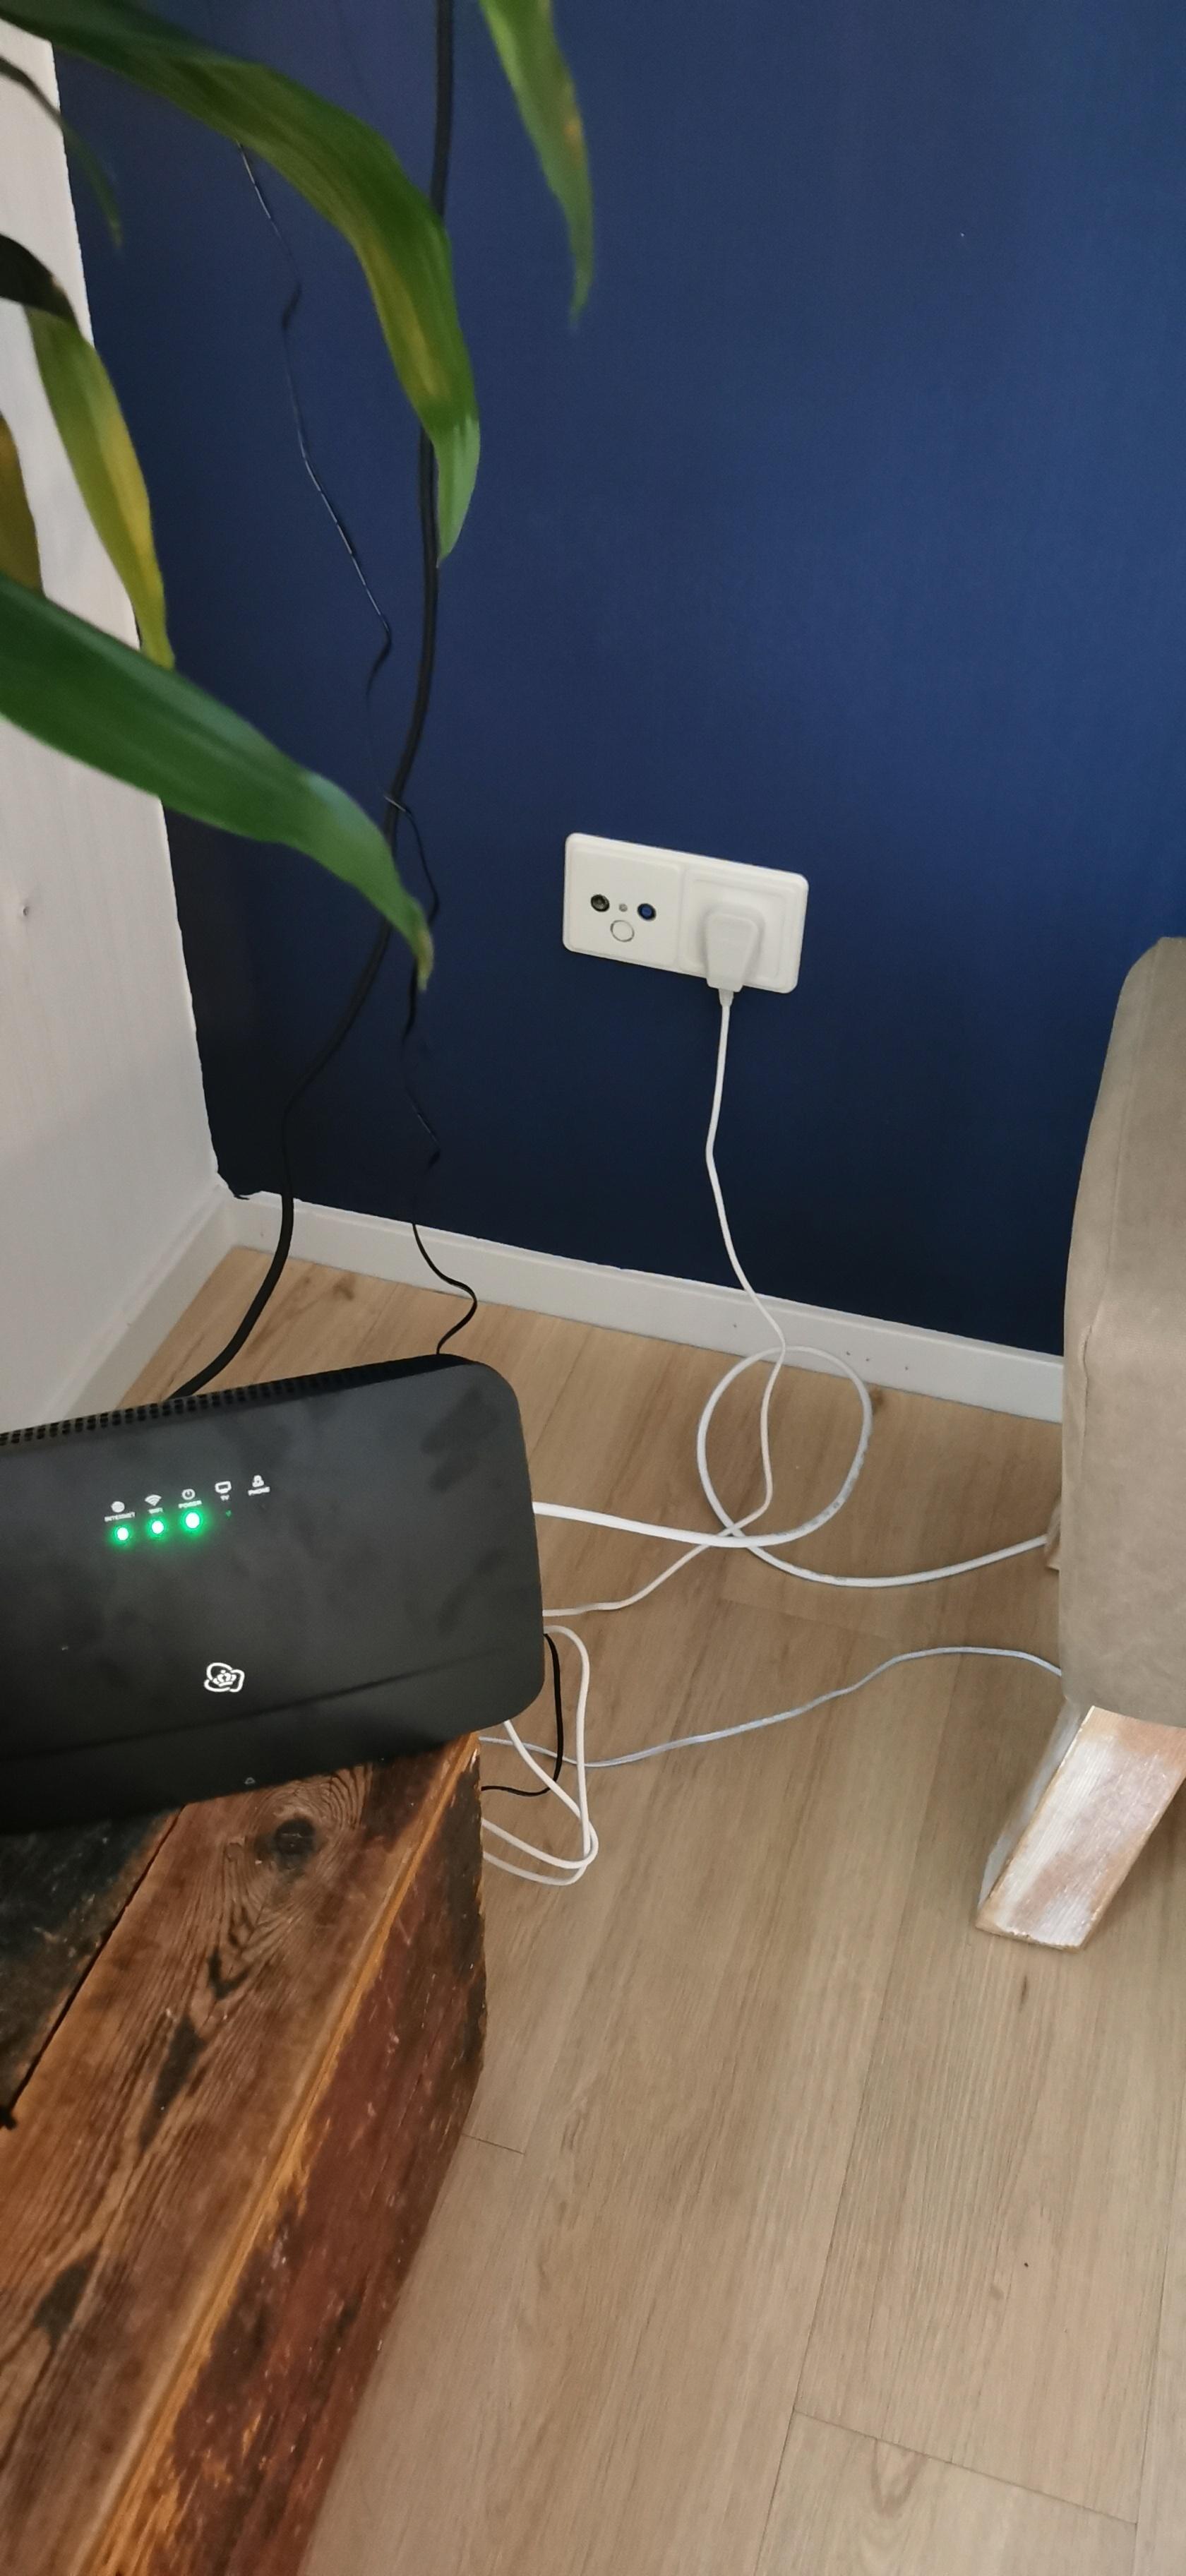 Isra Aansluiting Meterkast Netwerken Got